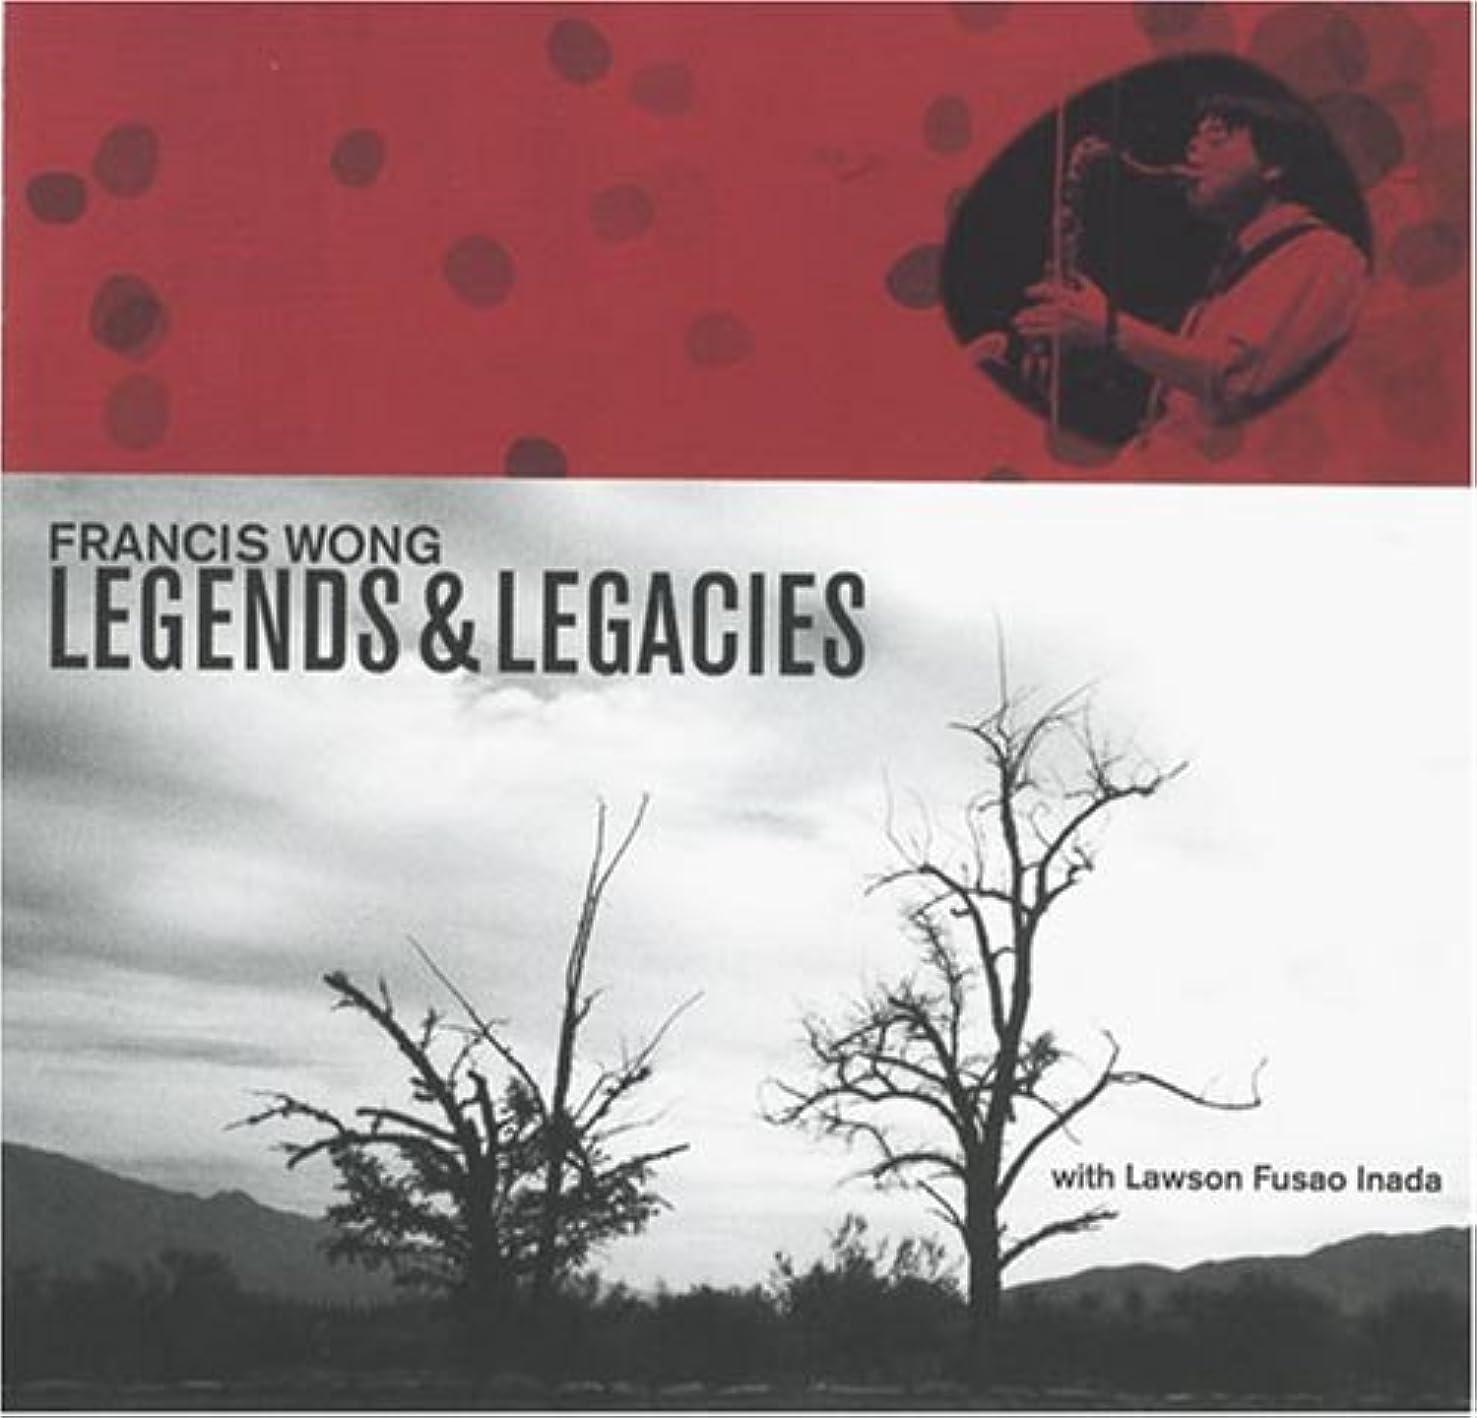 Legends & Legacies